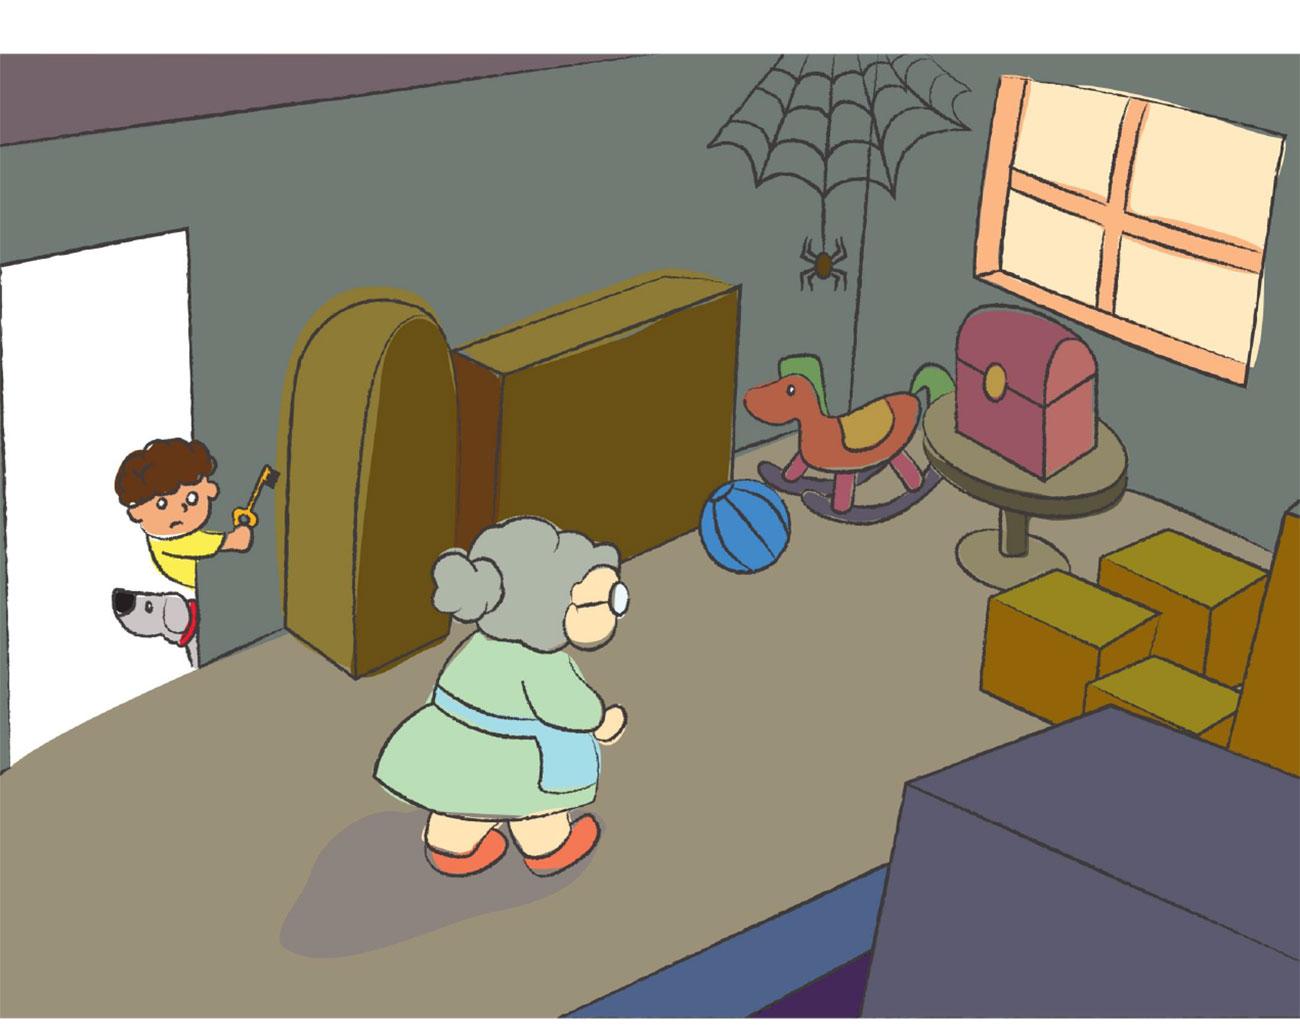 kids short story 'Down the memory lane with nash' by uma bala devarakonda - page 11